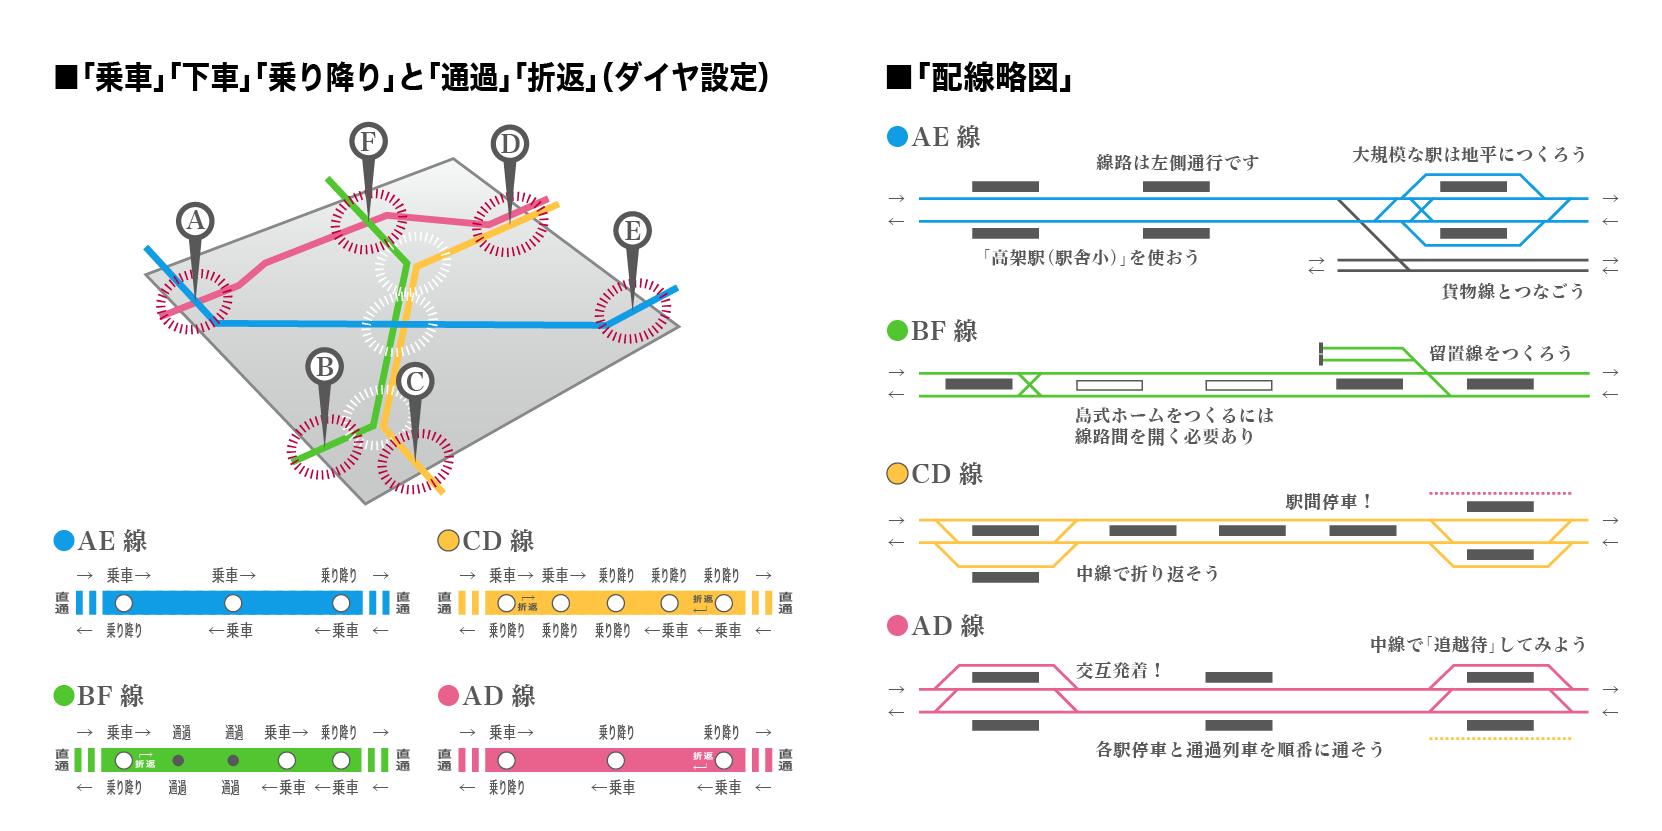 https://neorail.jp/forum/uploads/a9_basics_line02.png